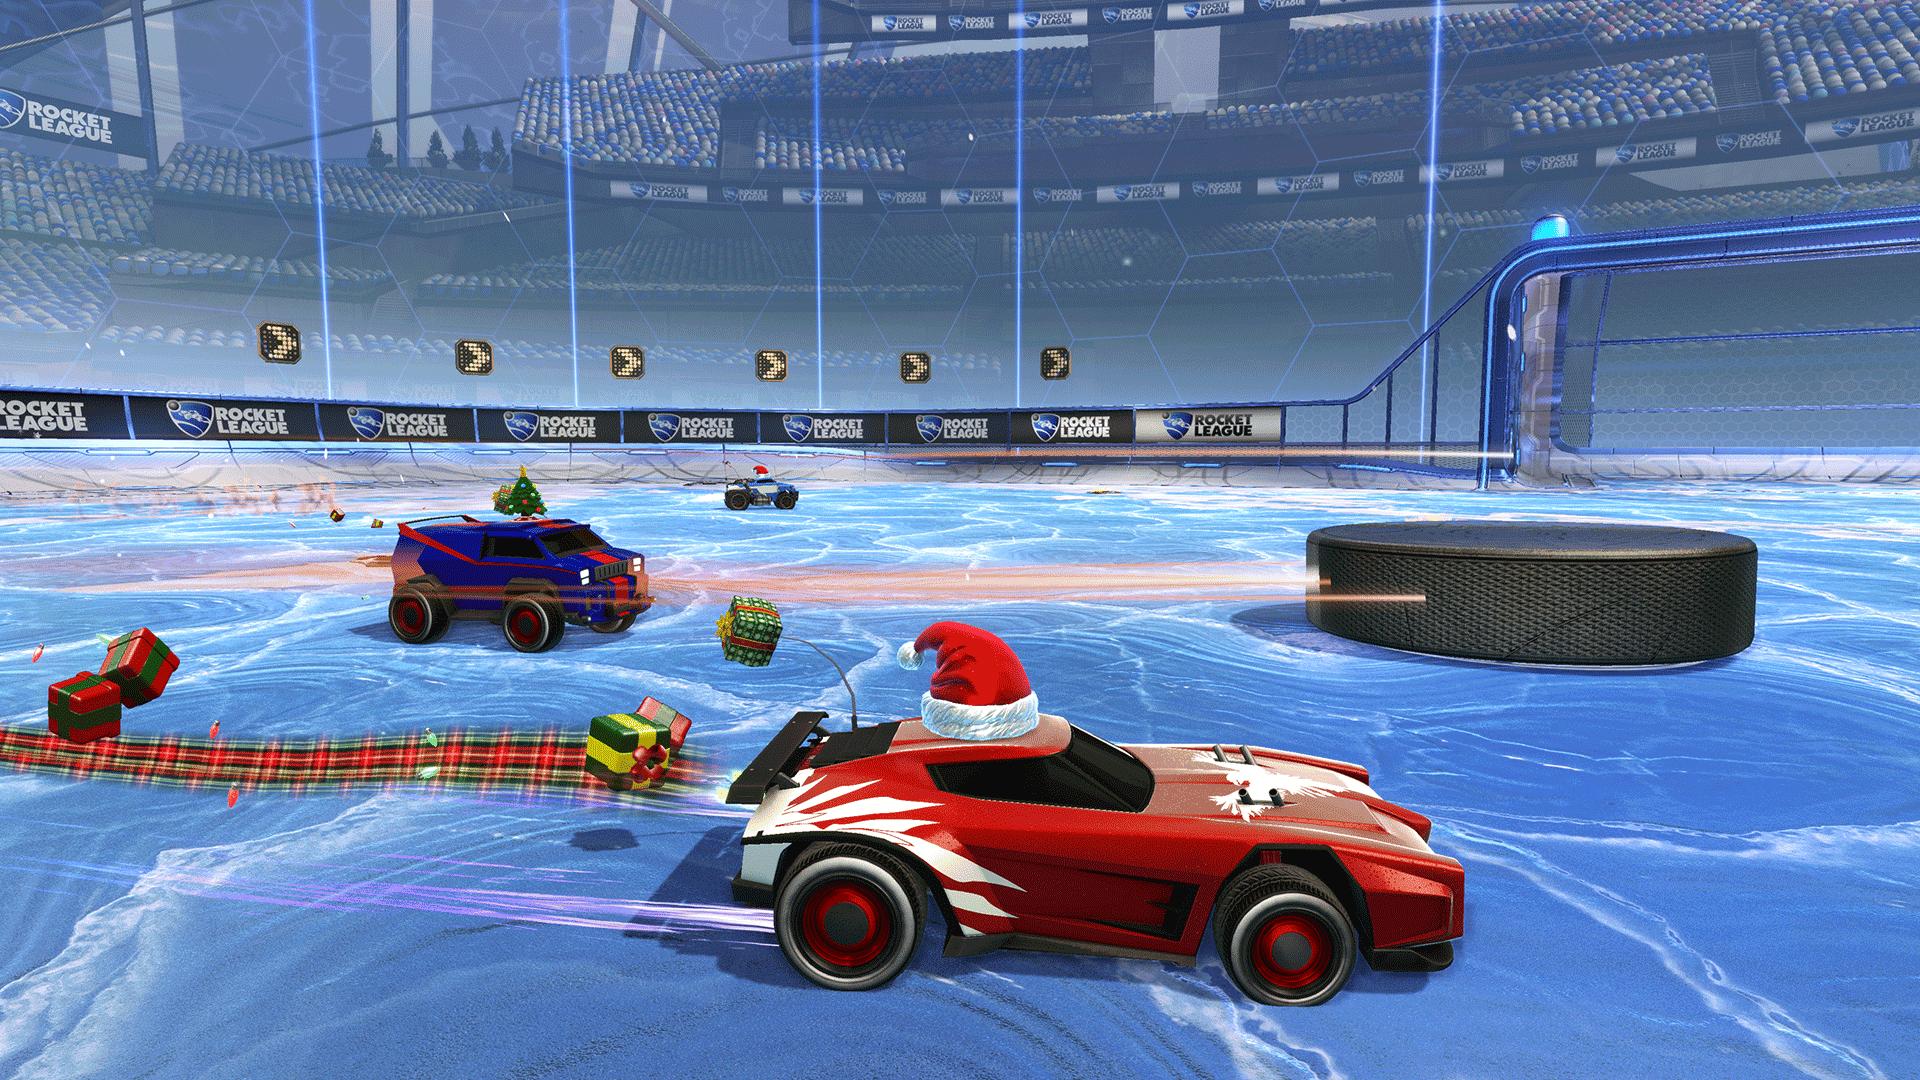 Rocketleague_WinterGames_3